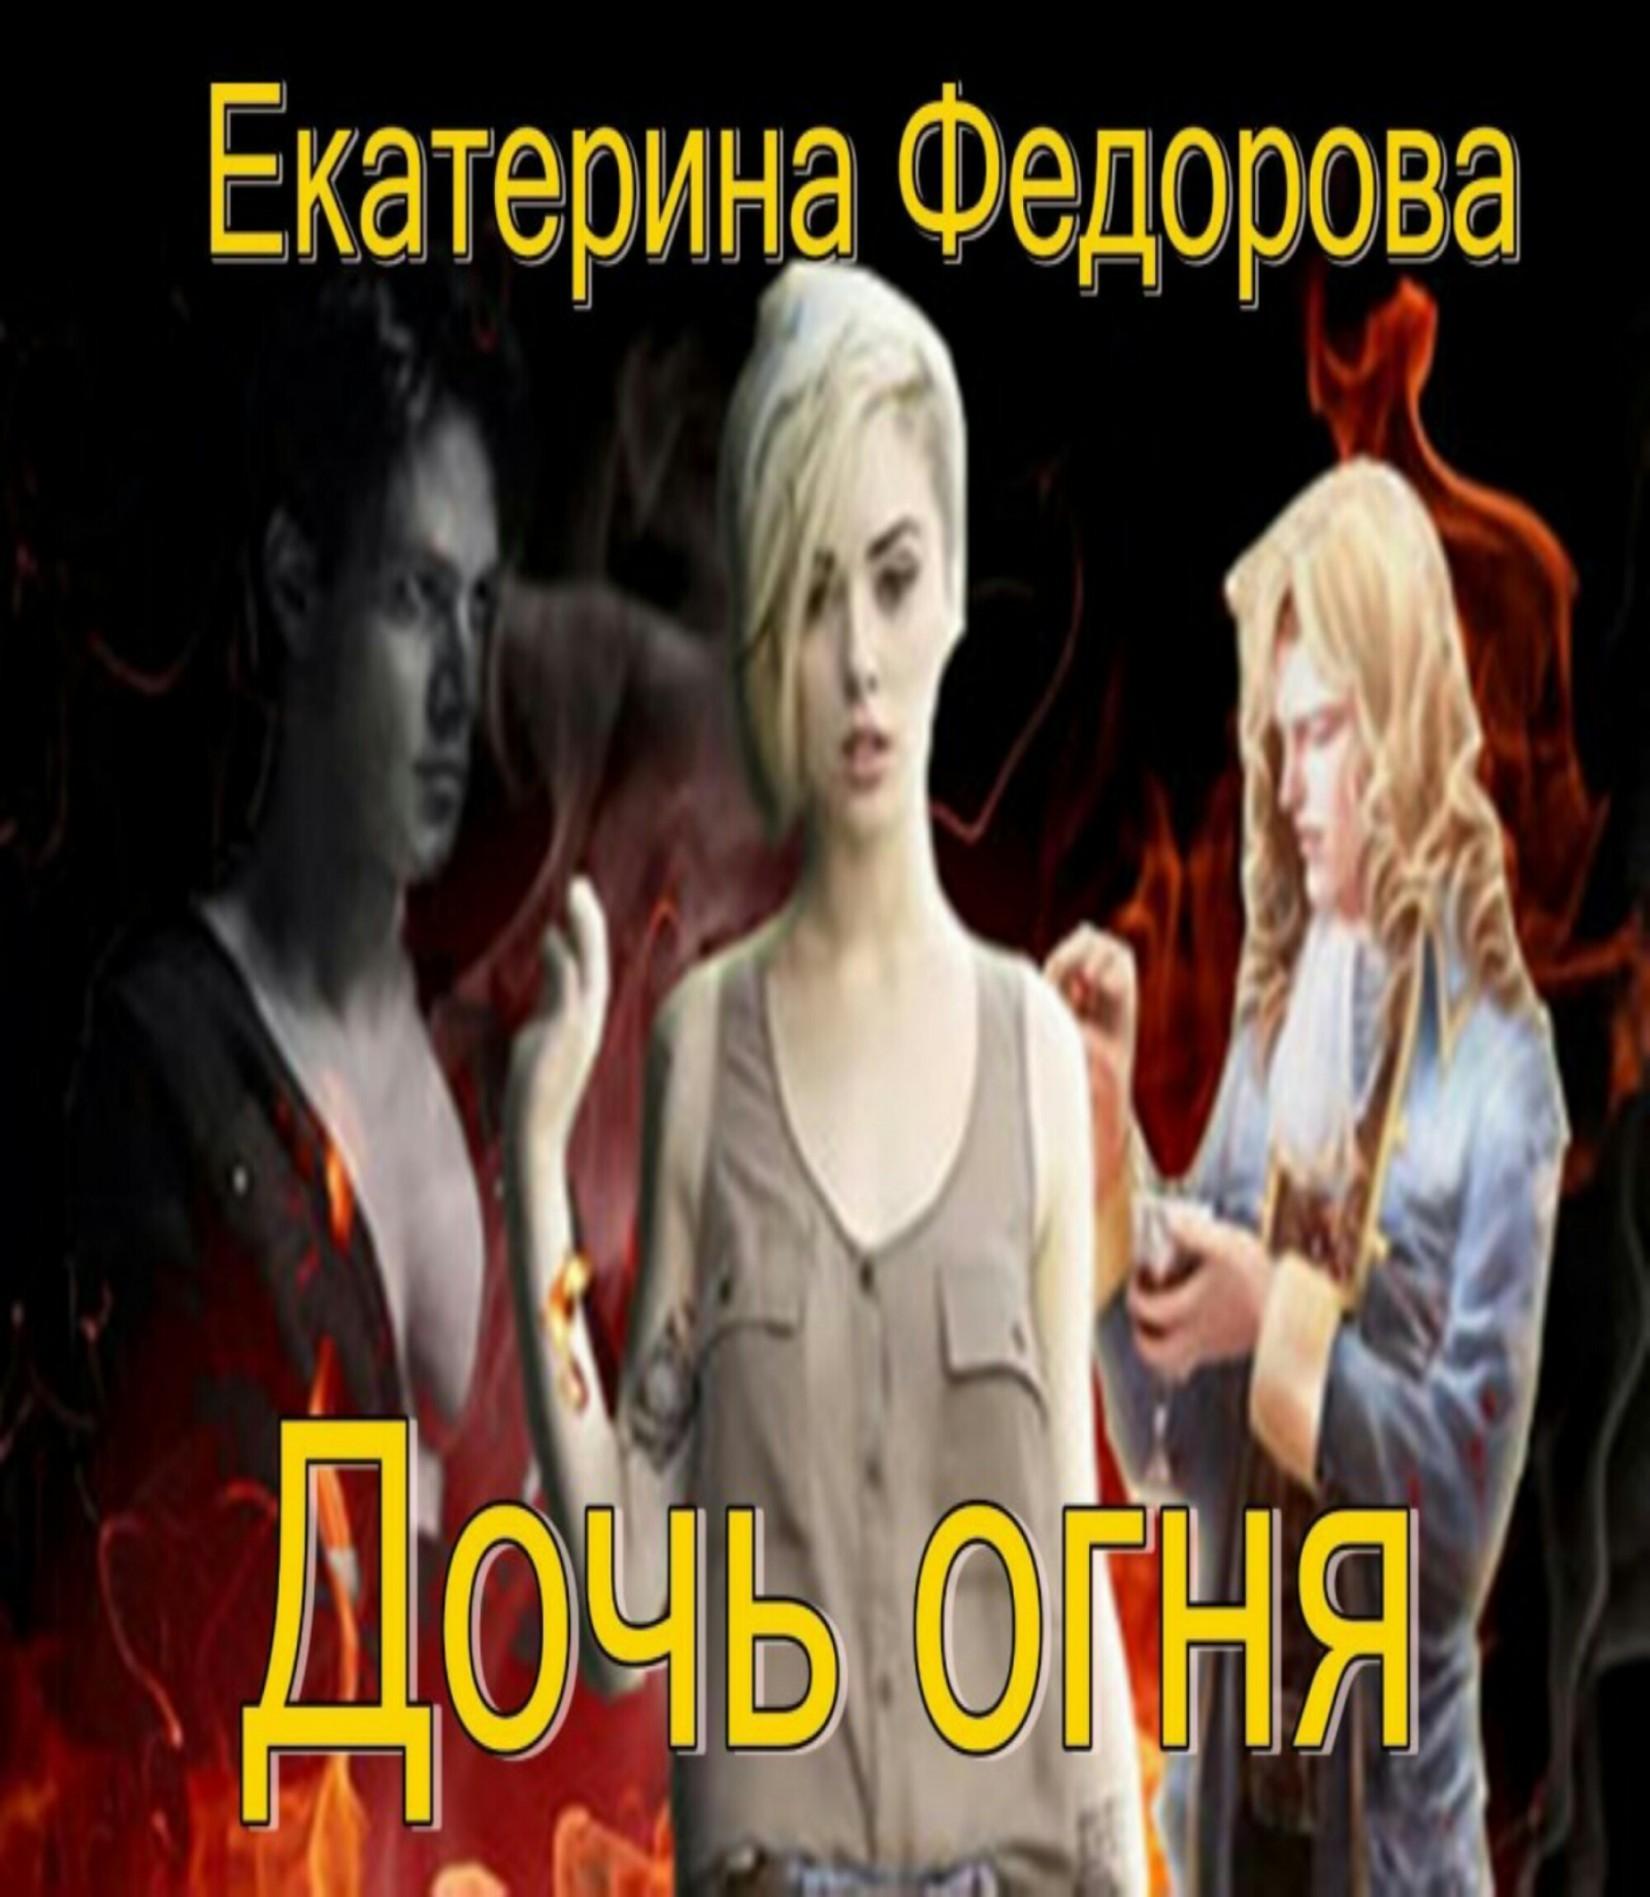 Екатерина Владимировна Федорова Дочь огня глаголева екатерина владимировна луи рено